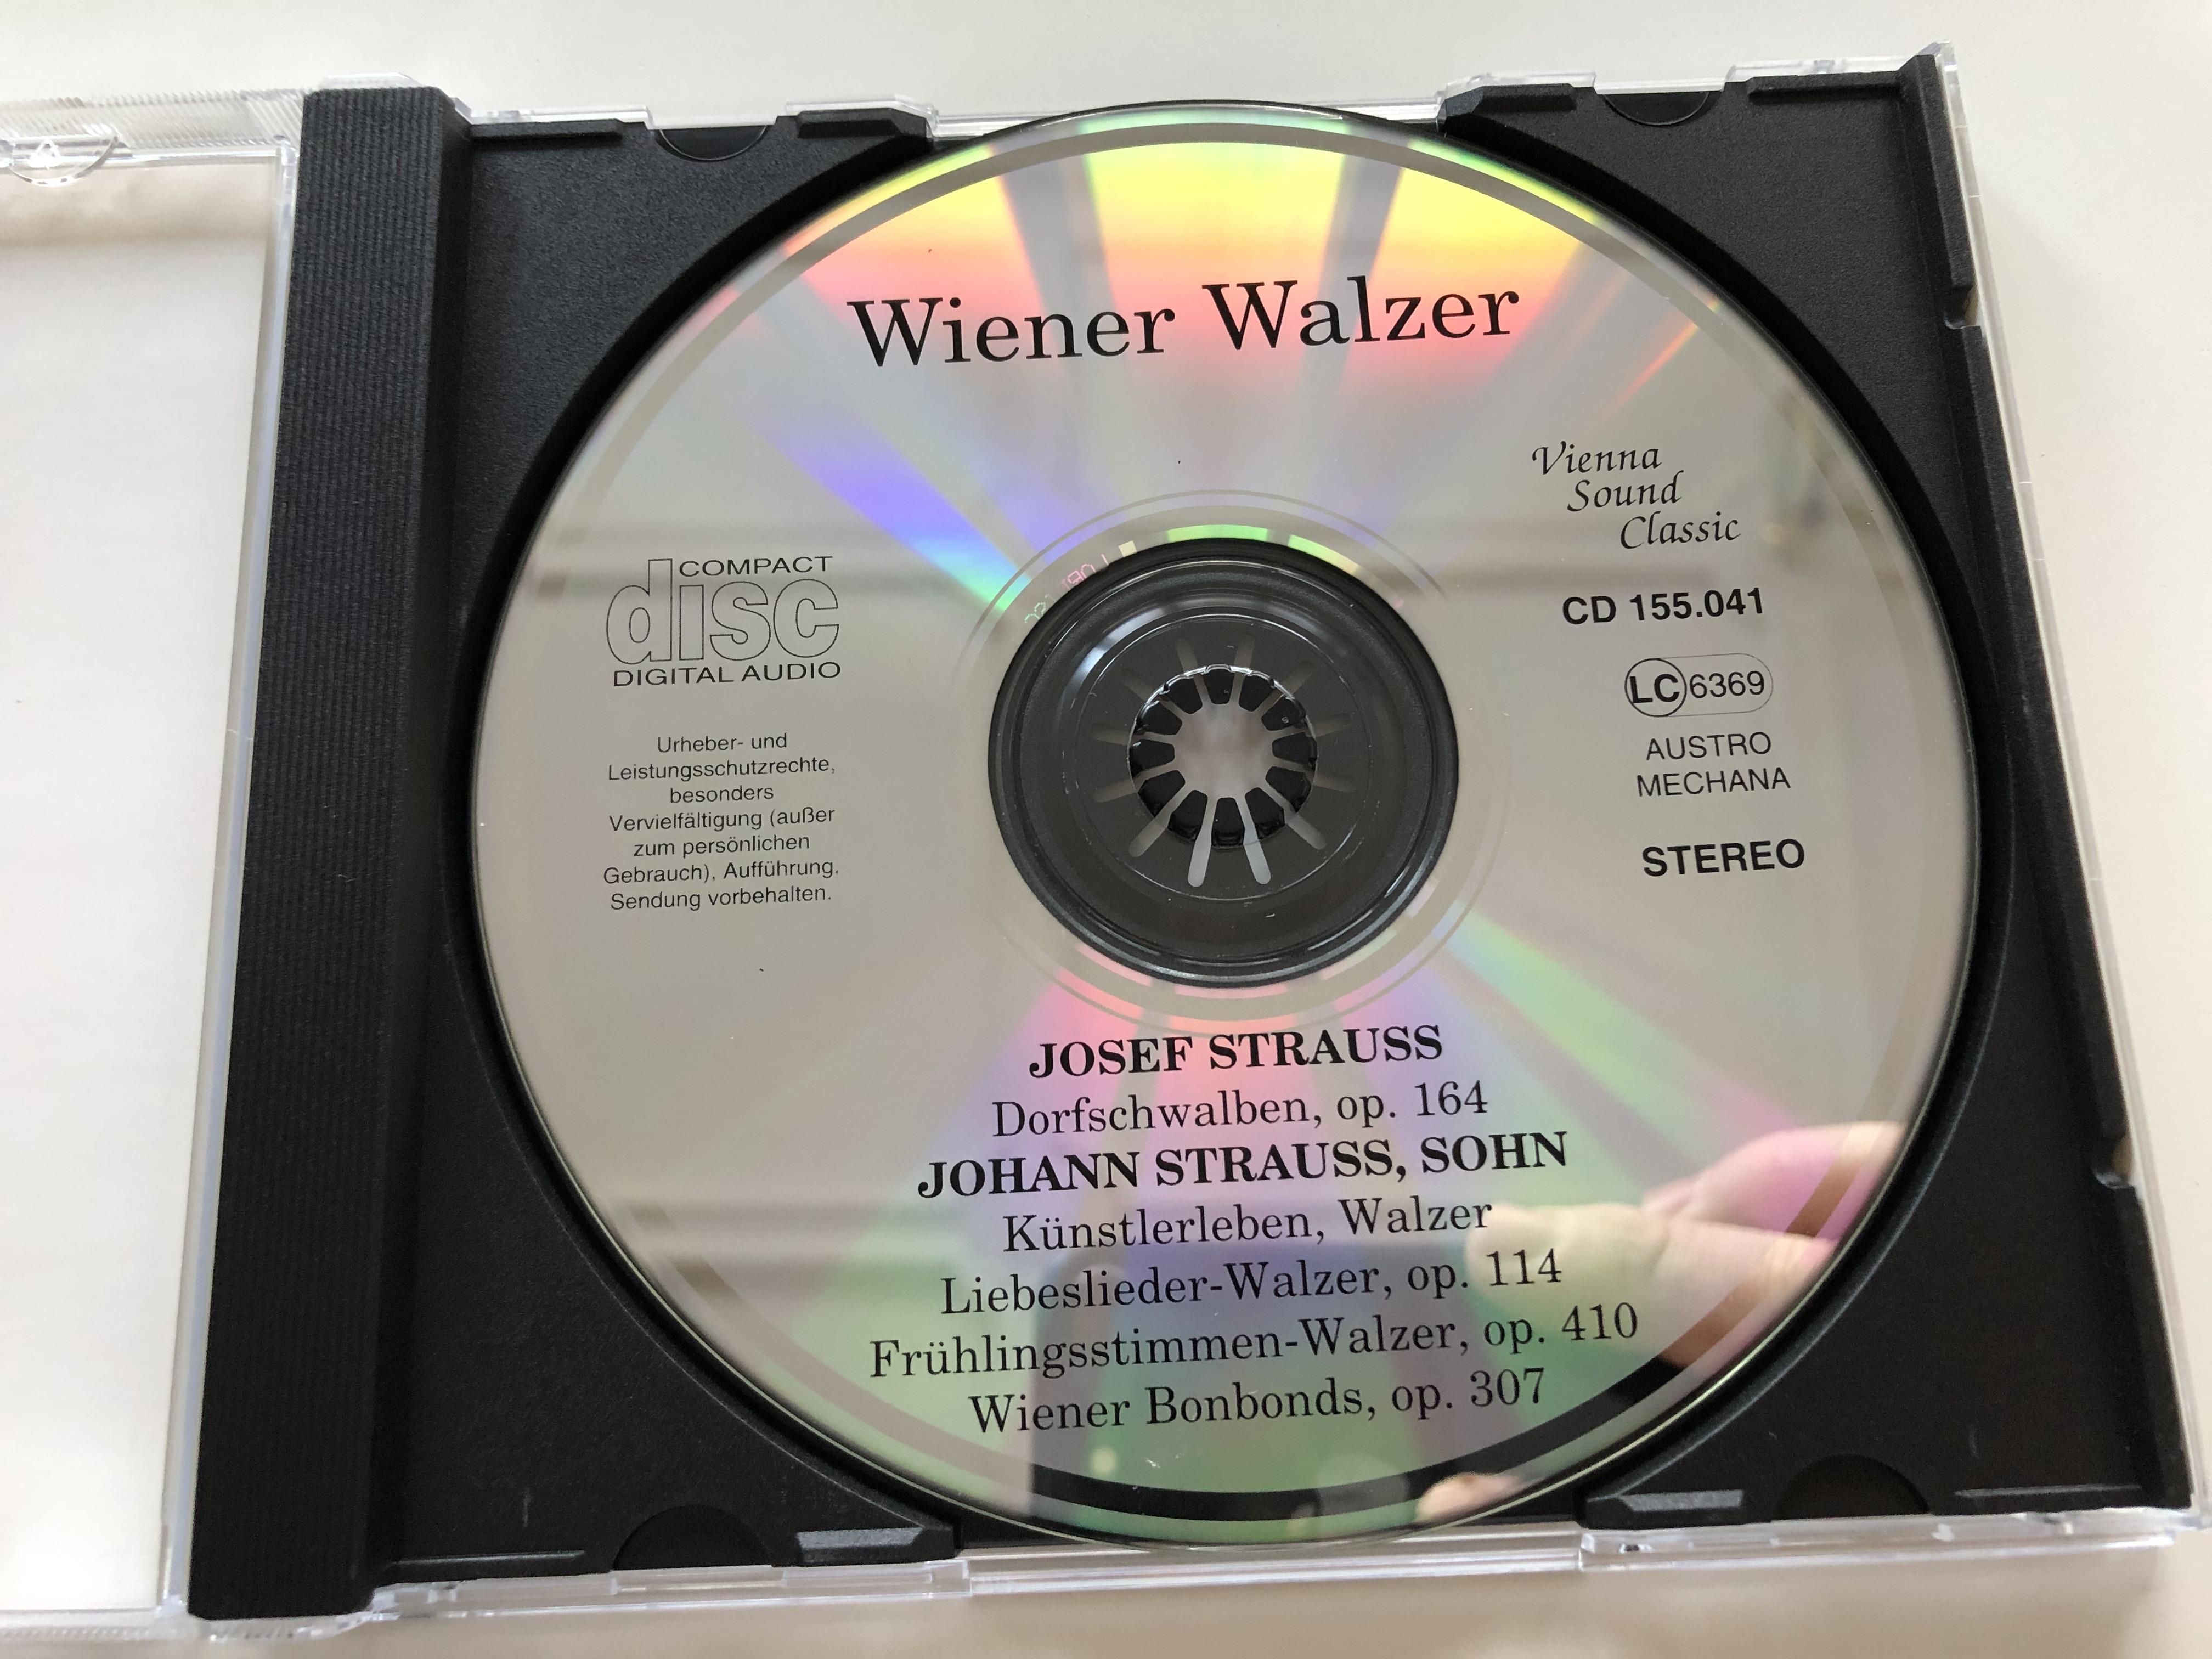 wiener-walzerimg-2526.jpg